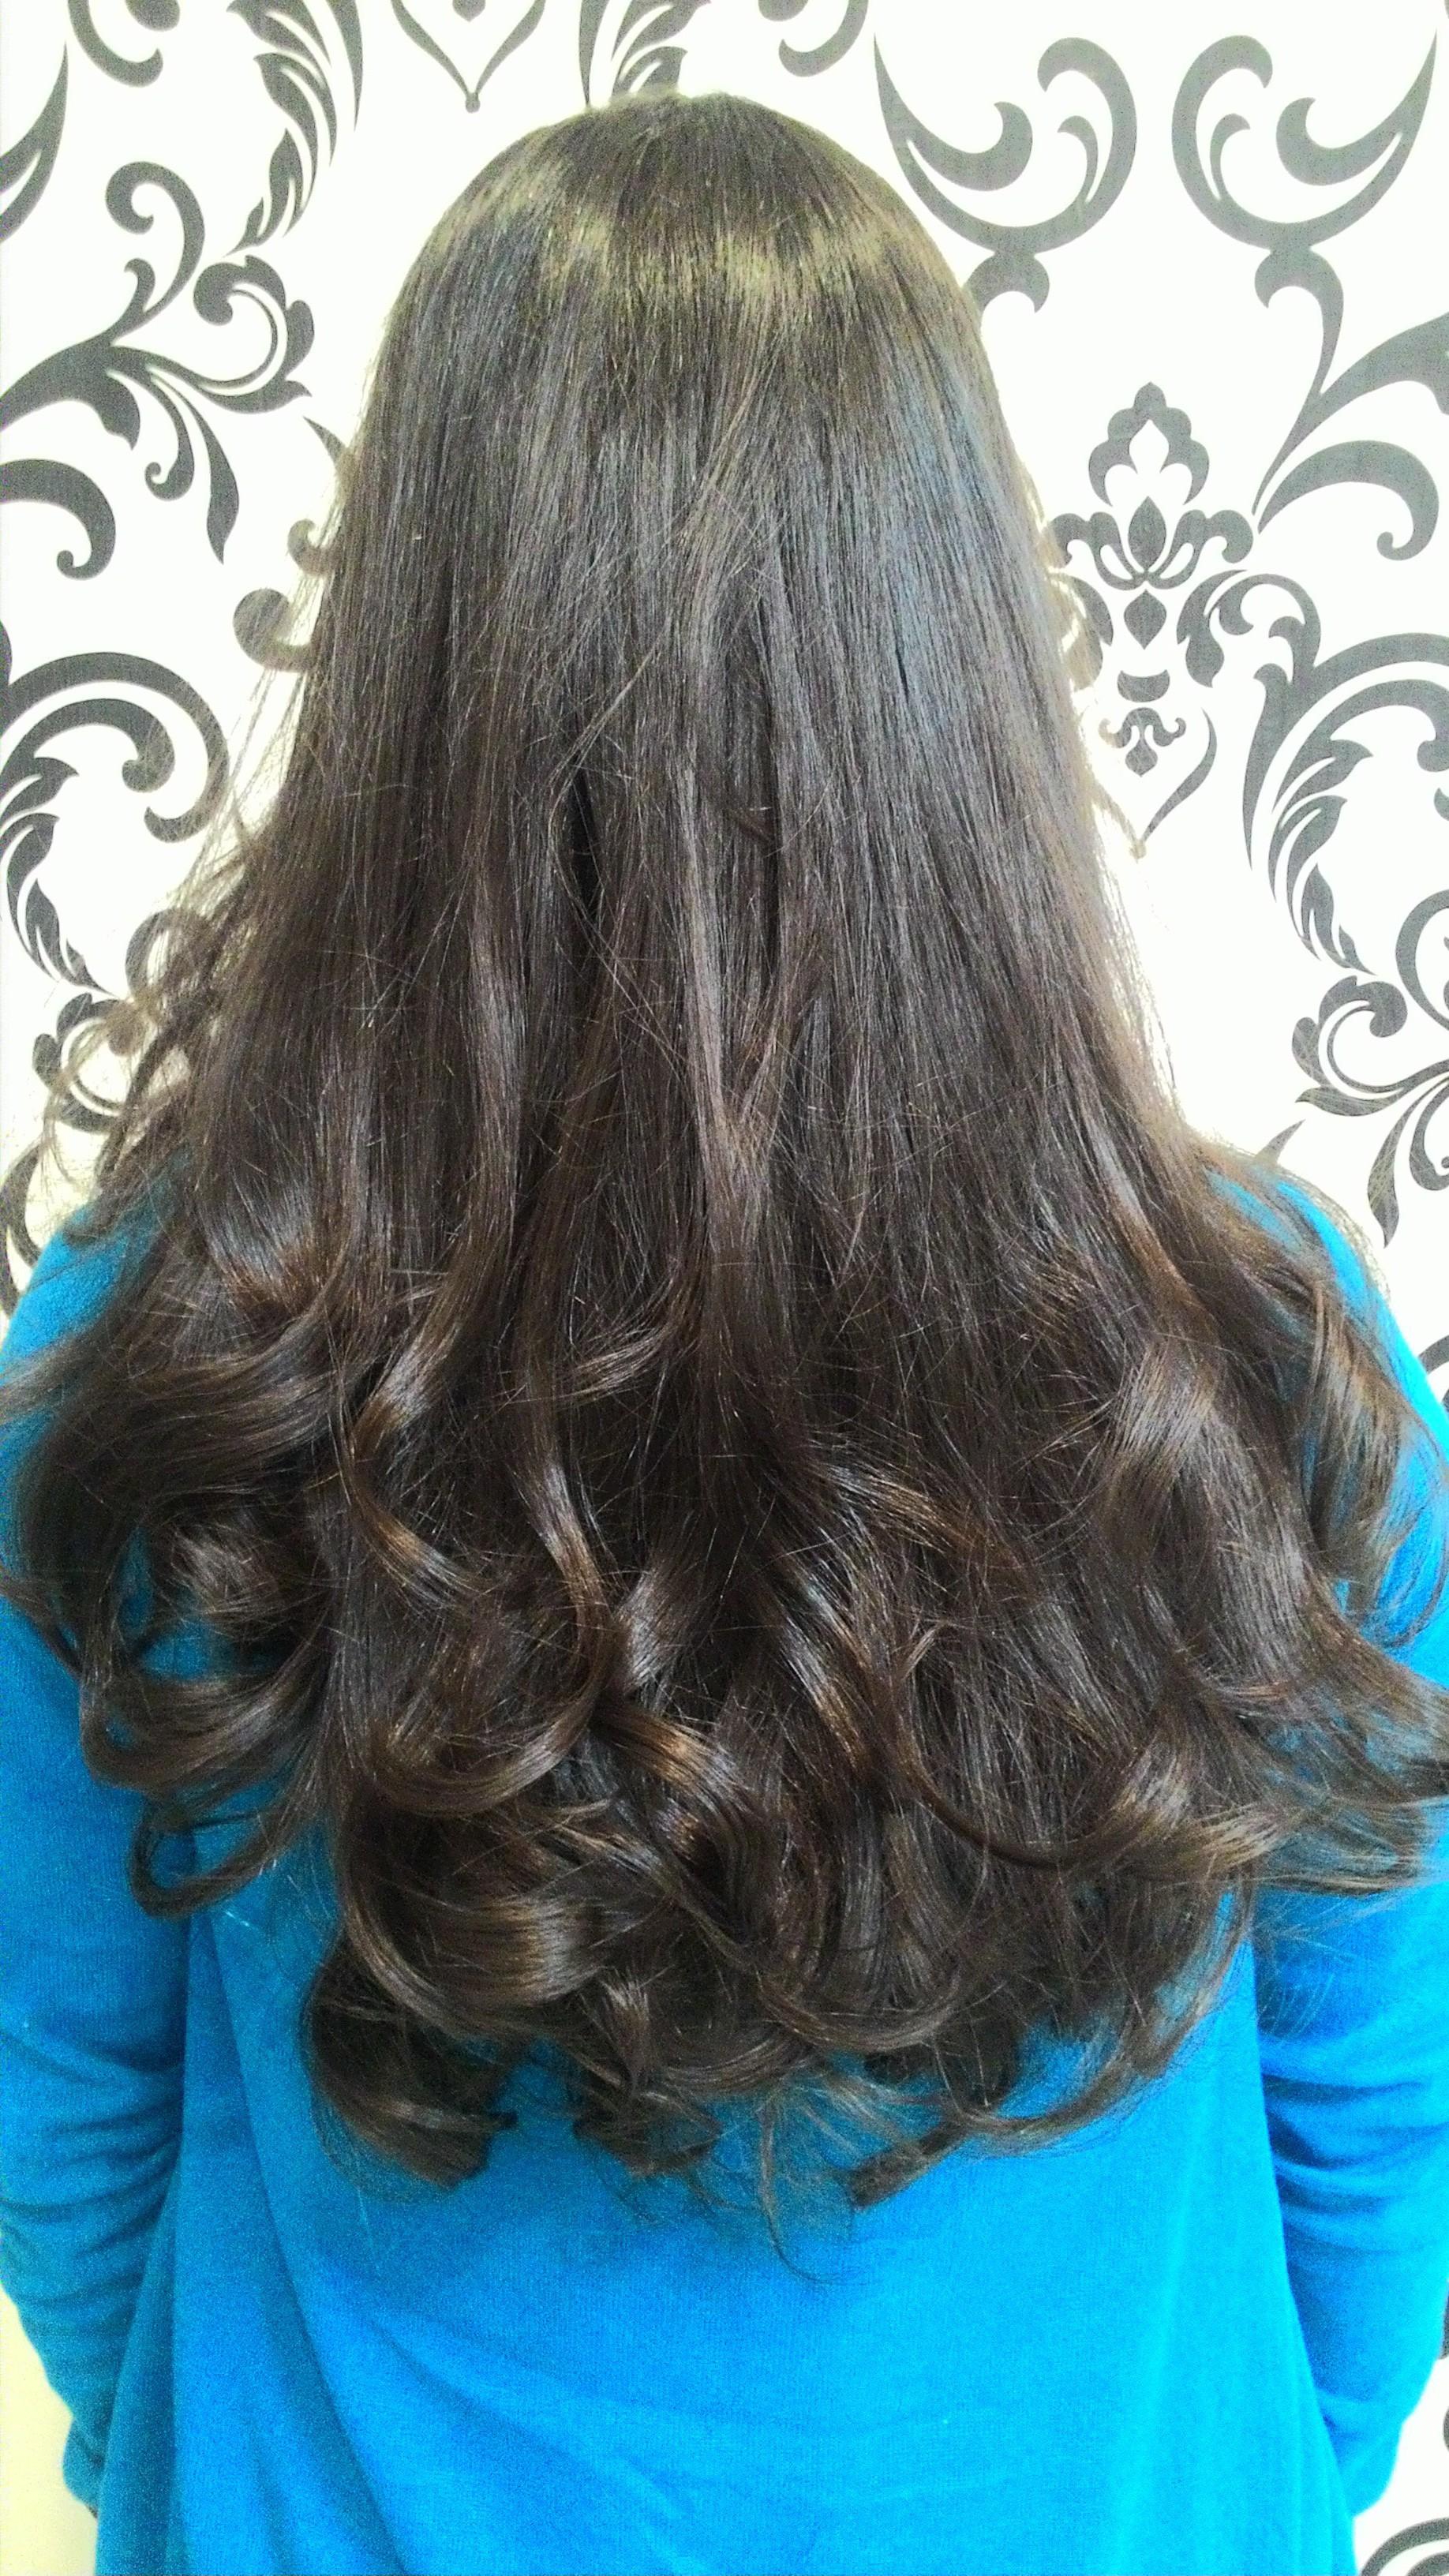 Tratamento, corte e escova cabelo cabeleireiro(a) auxiliar cabeleireiro(a) escovista